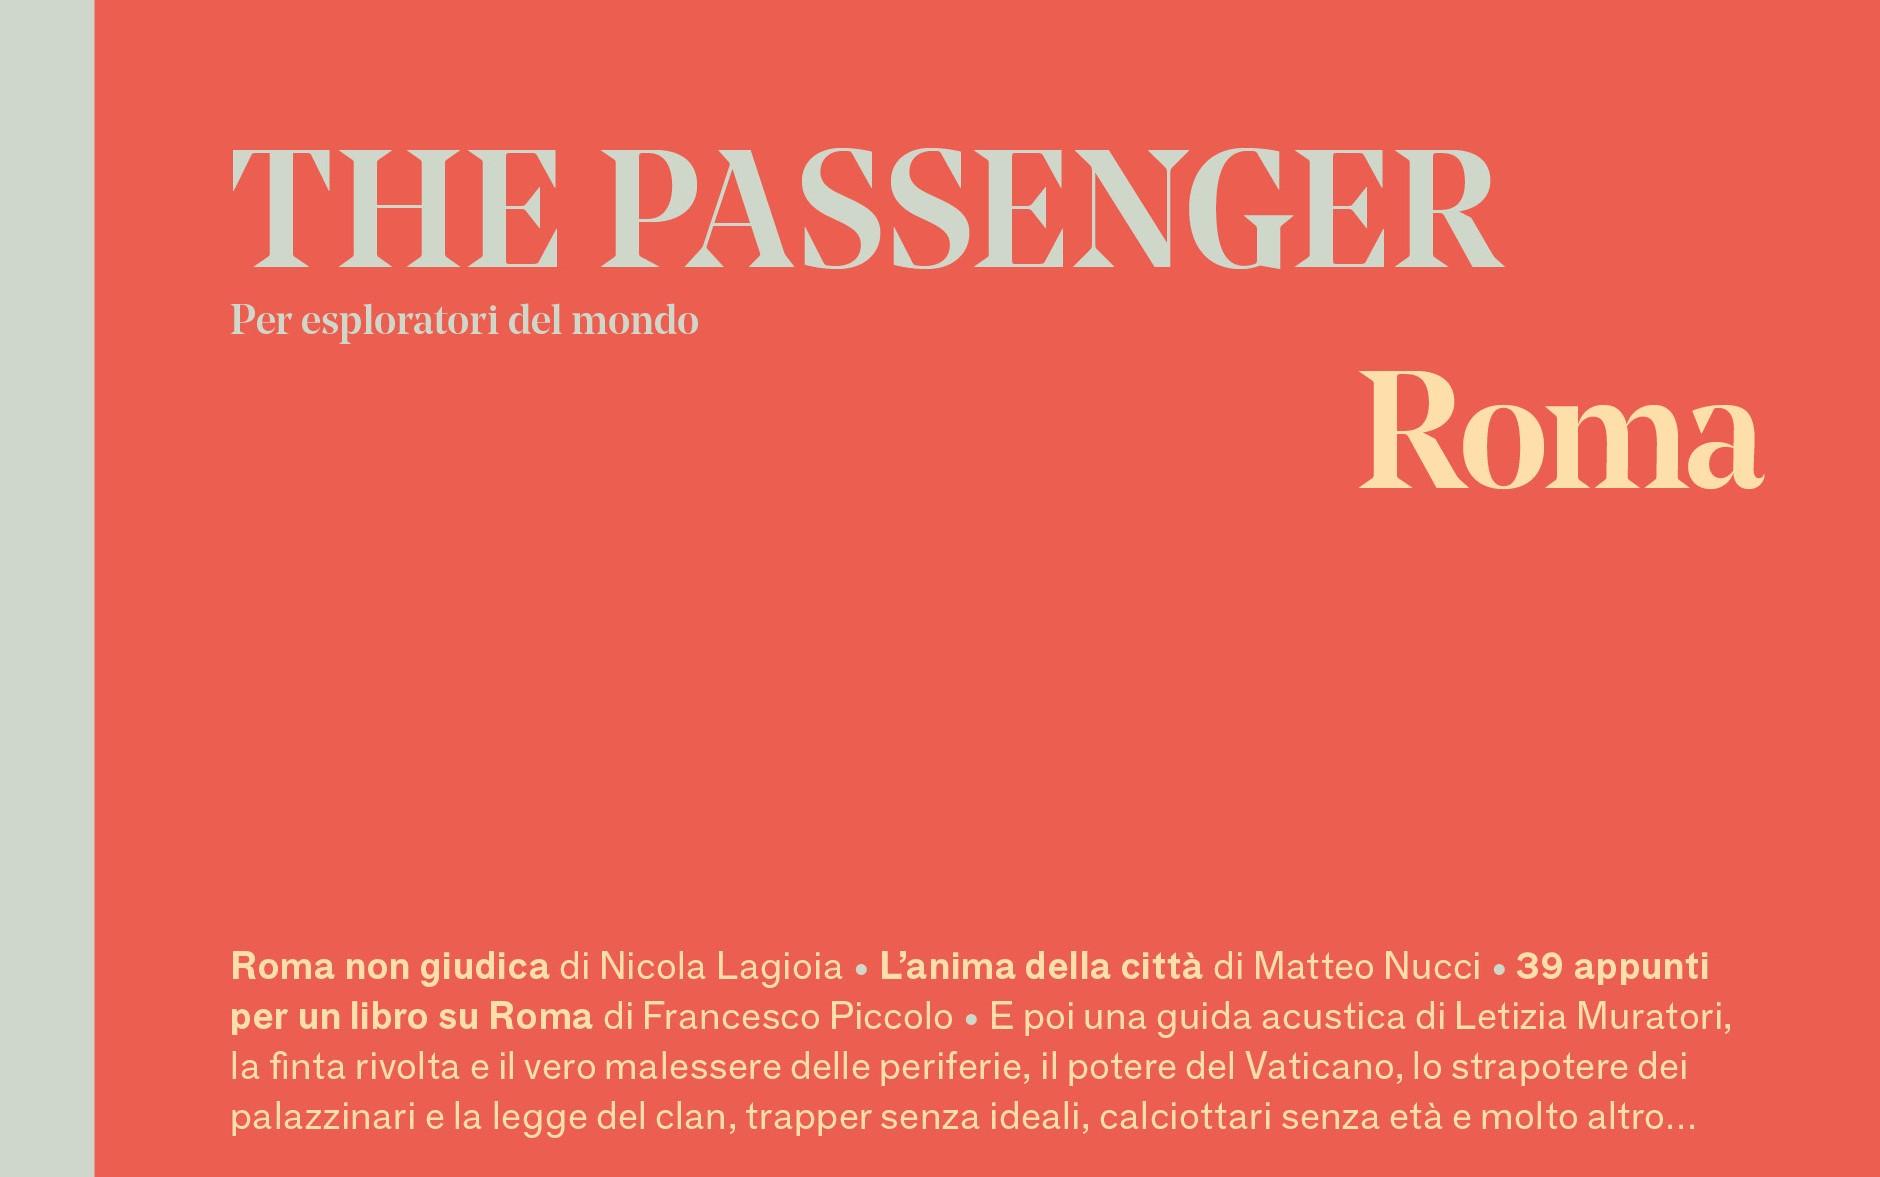 the-passenger-roma-cover